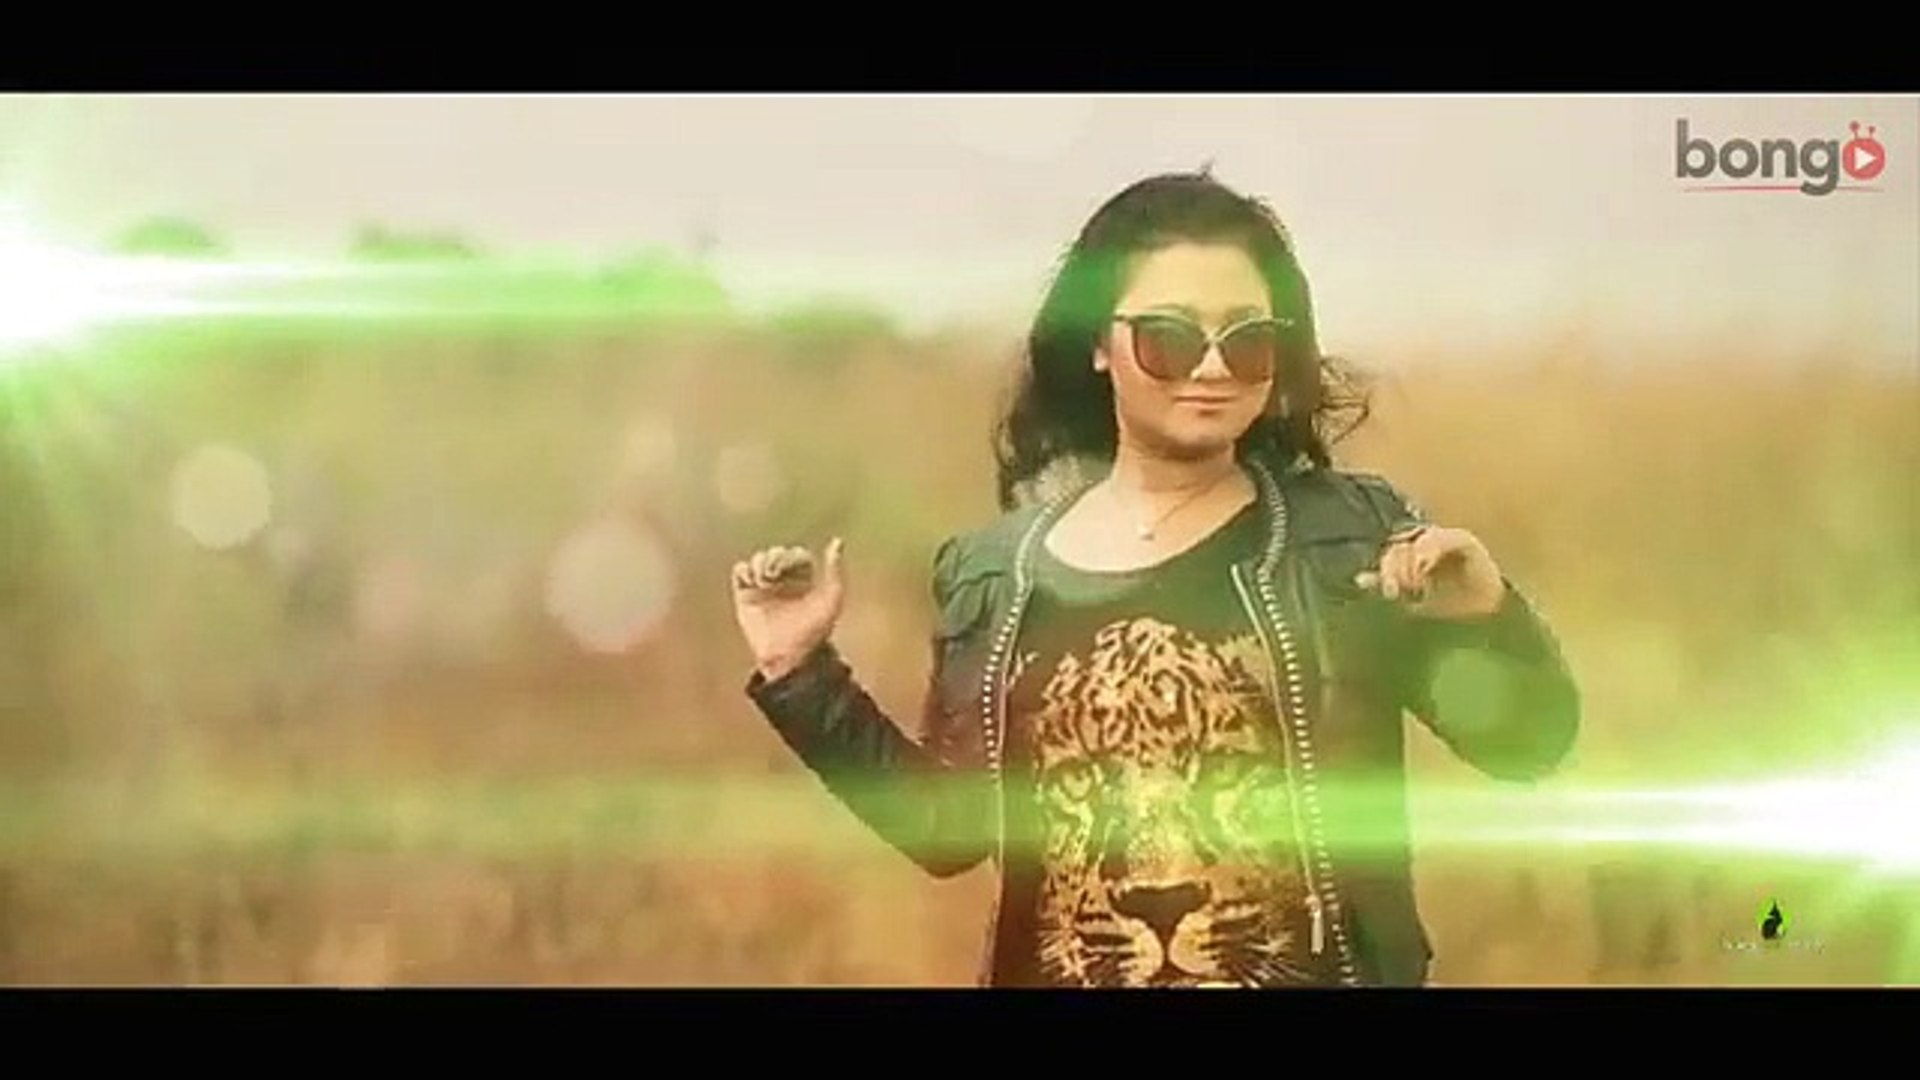 Beshamal - Imran & Zhilik bangladeshi new bengali gaan bangladesh bangla song